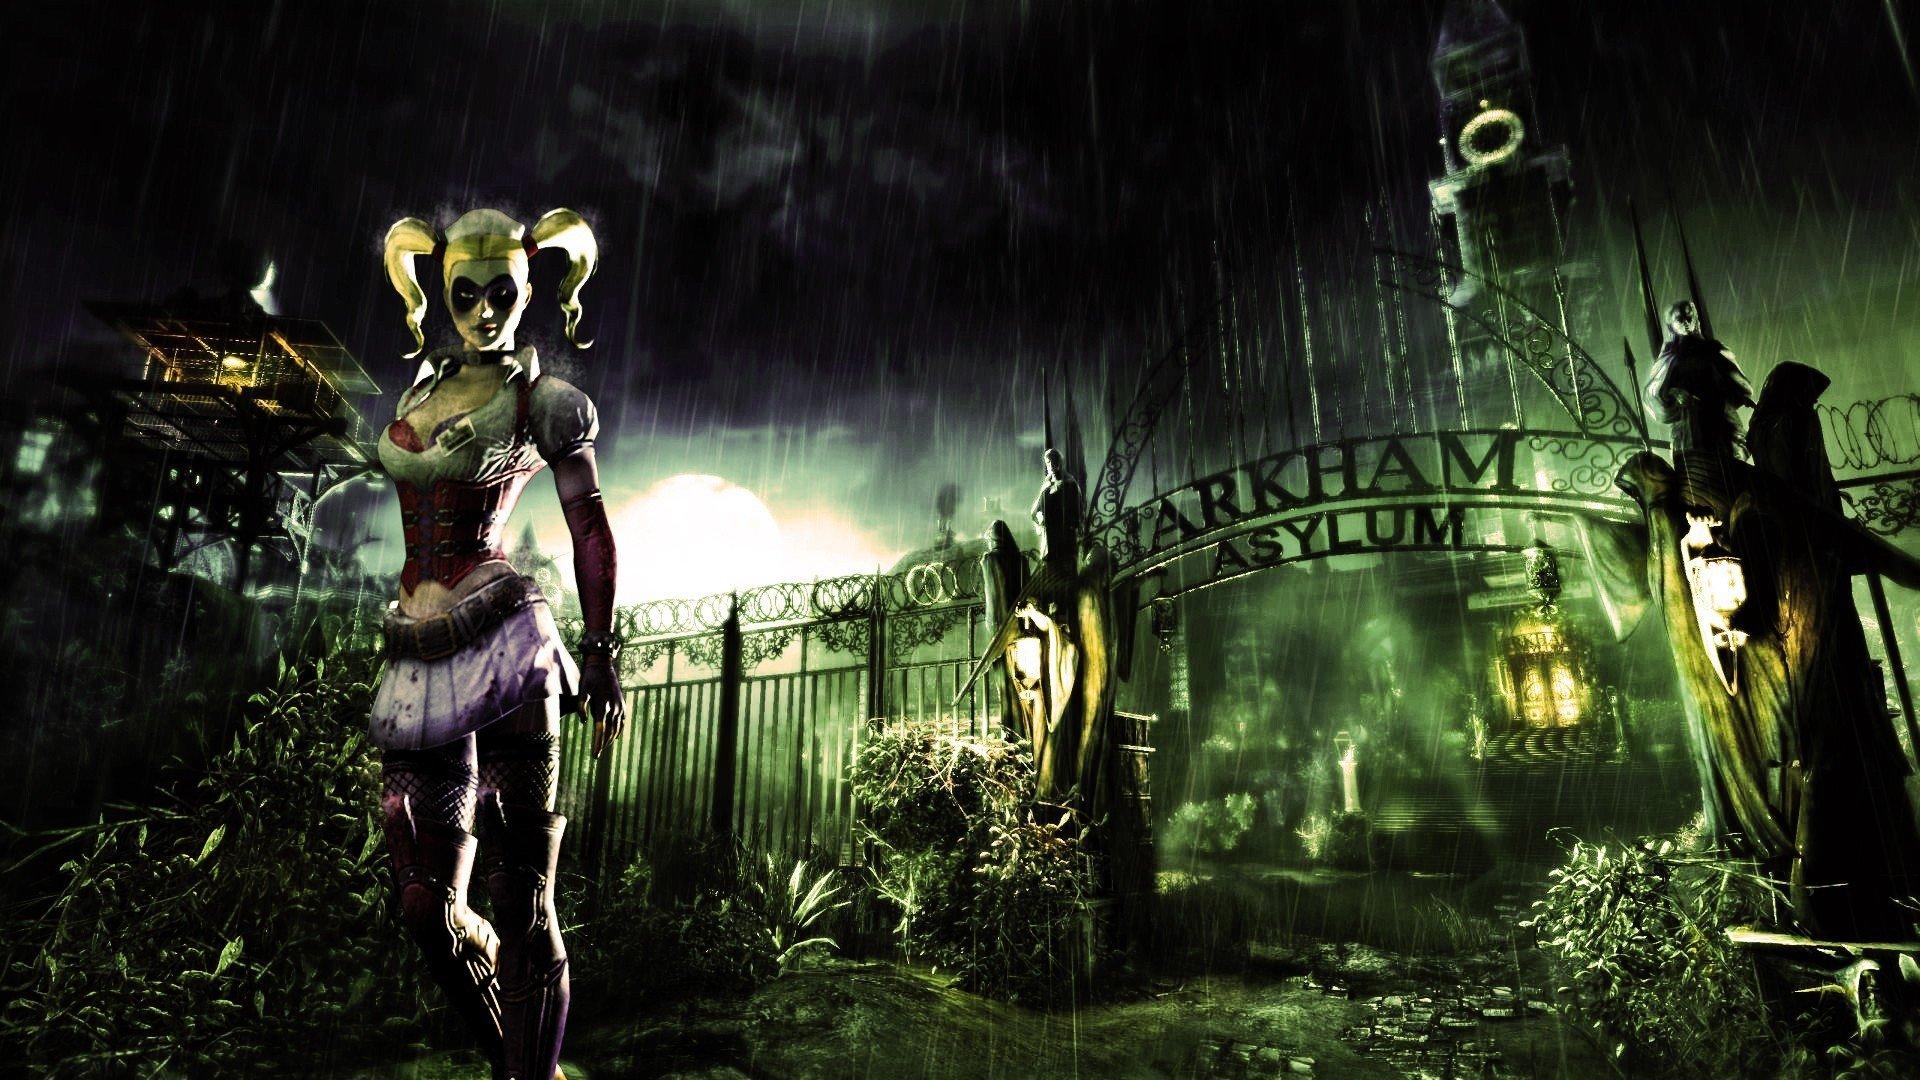 Harley Quinn Video Games Batman Arkham Asylum Hd Wallpapers